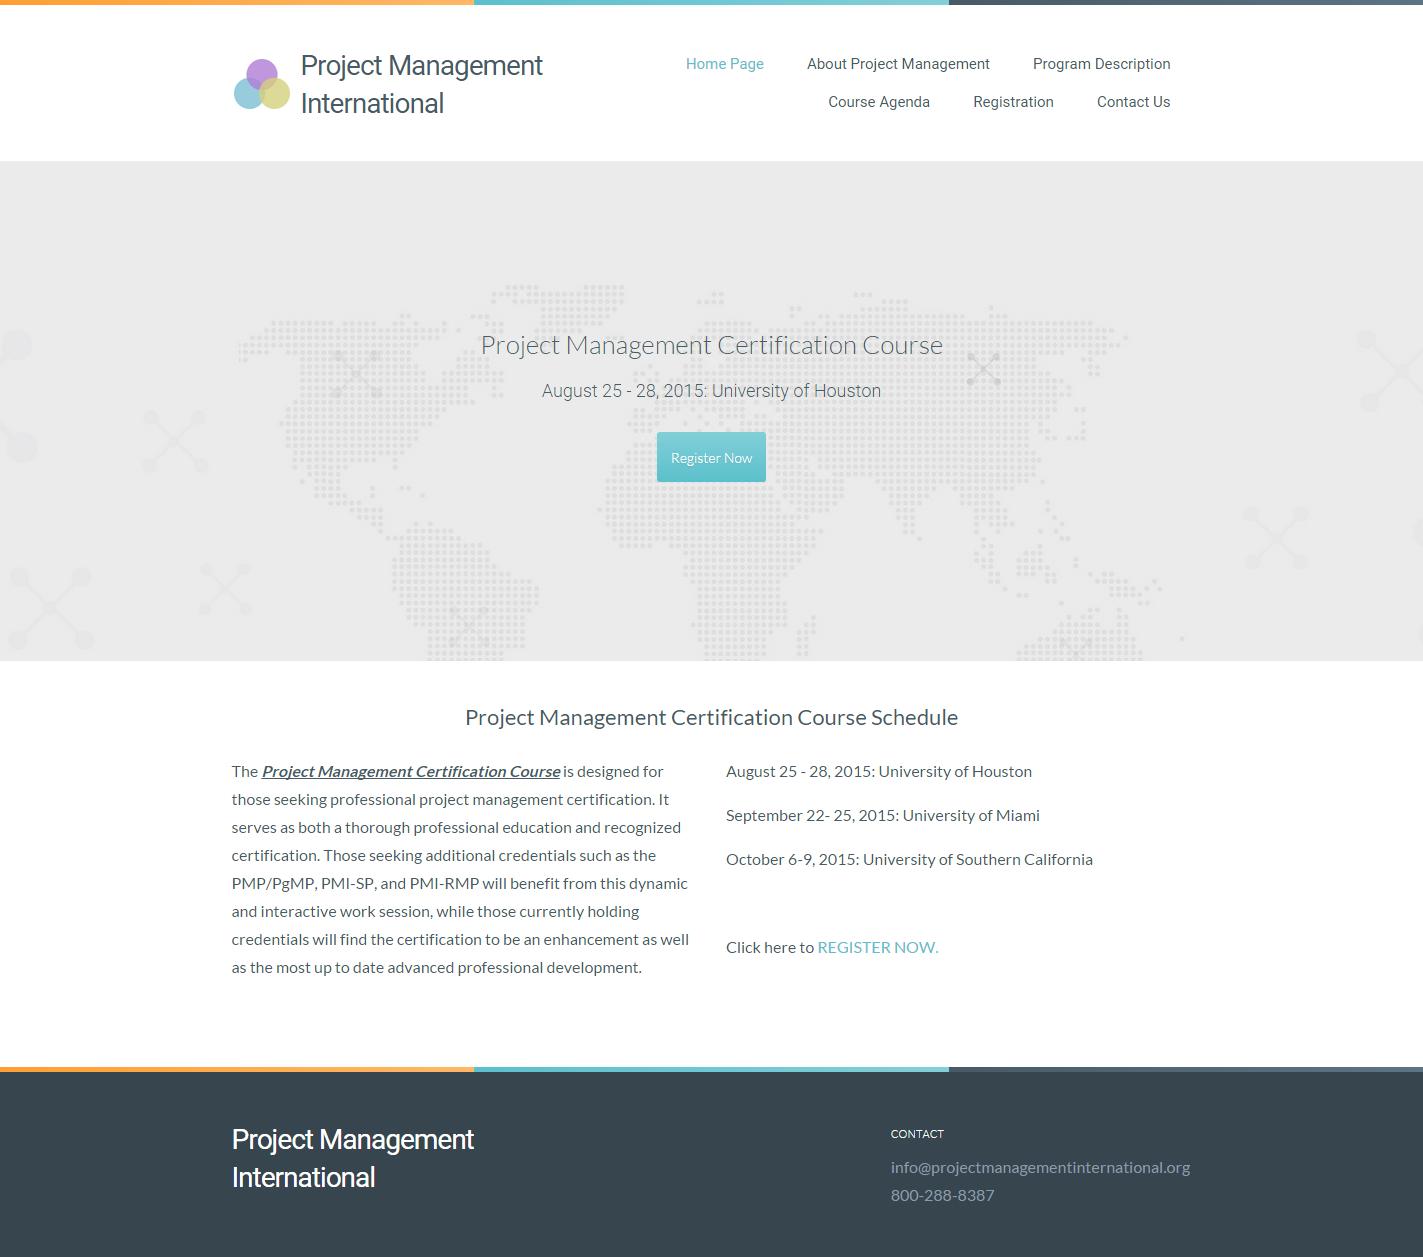 Dynamoos Blog Warning Projectmanagementinternational